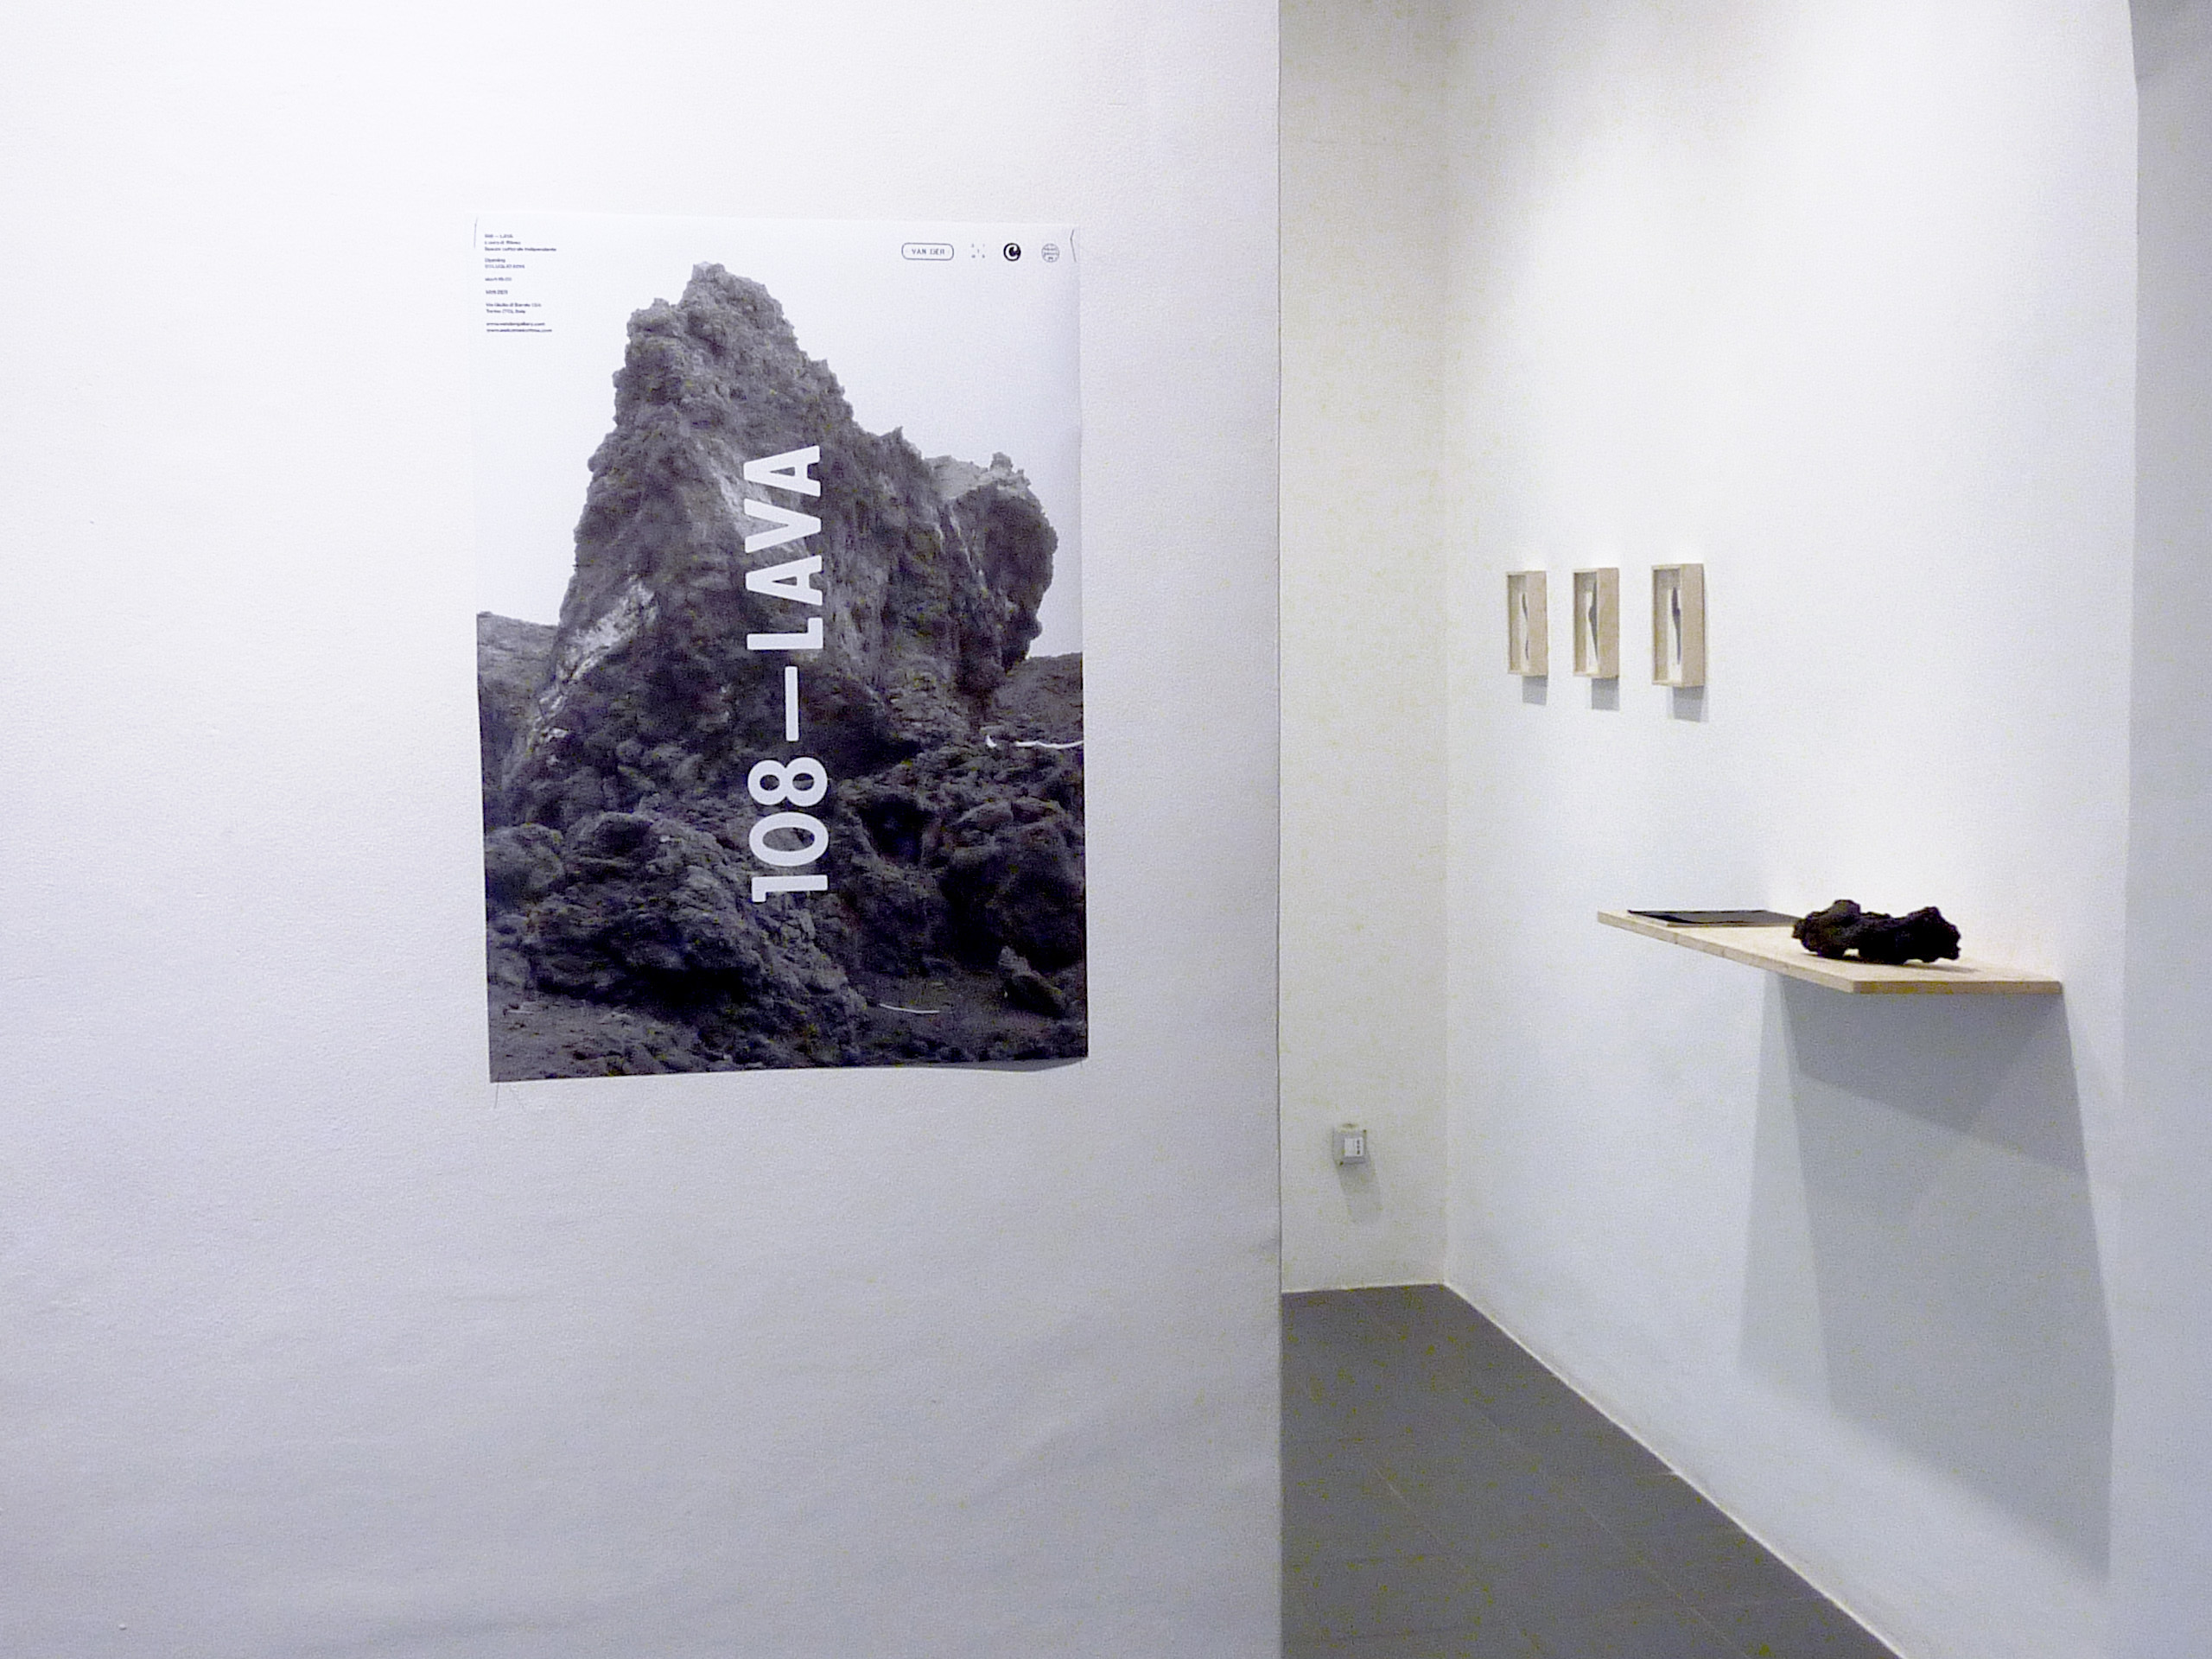 108-lava-at-van-der-gallery-recap-02